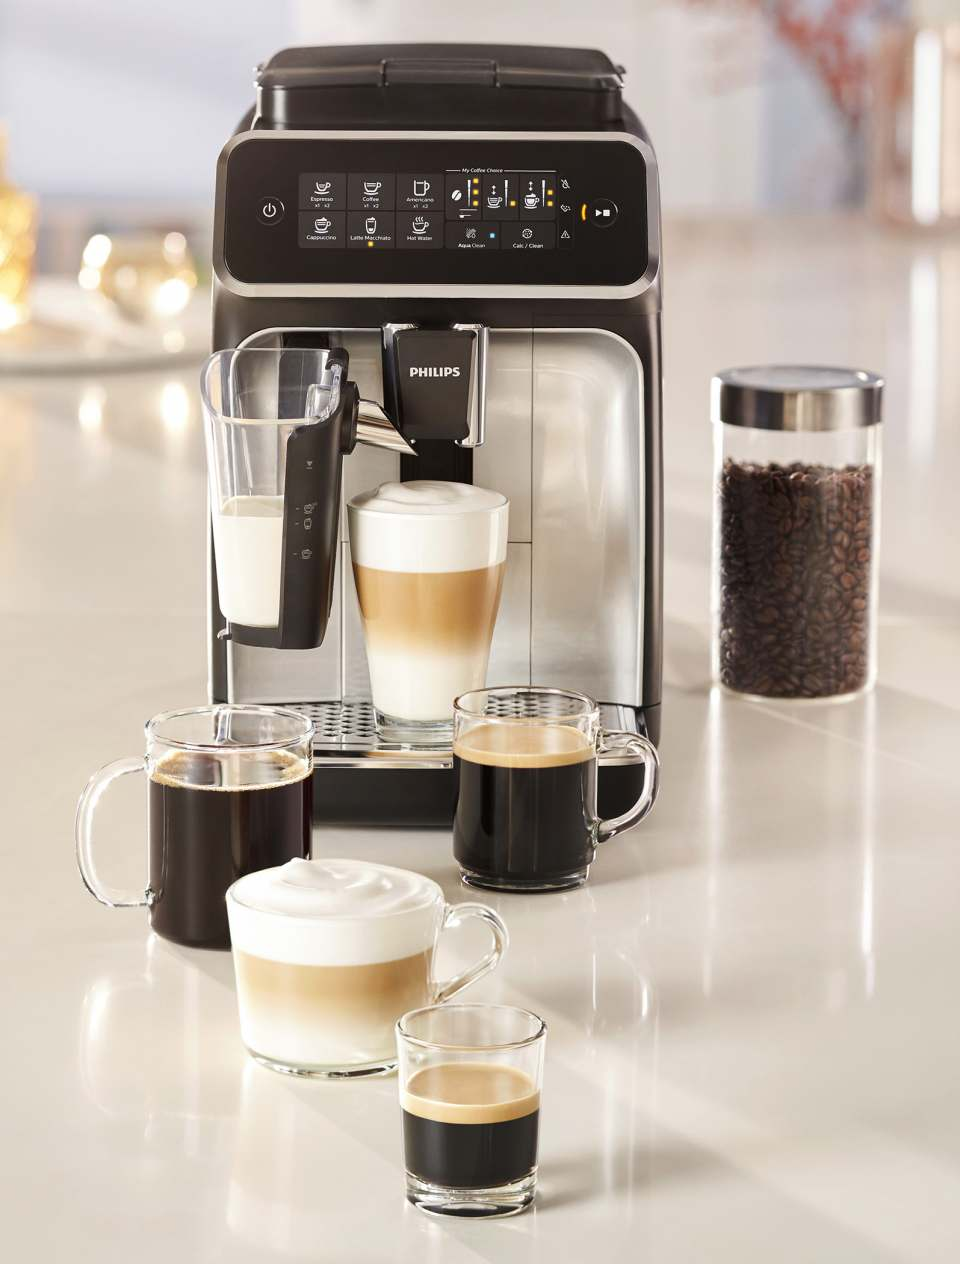 Philips Kaffeevollautomat Serie 3200 mit LatteGo Milchsystem.